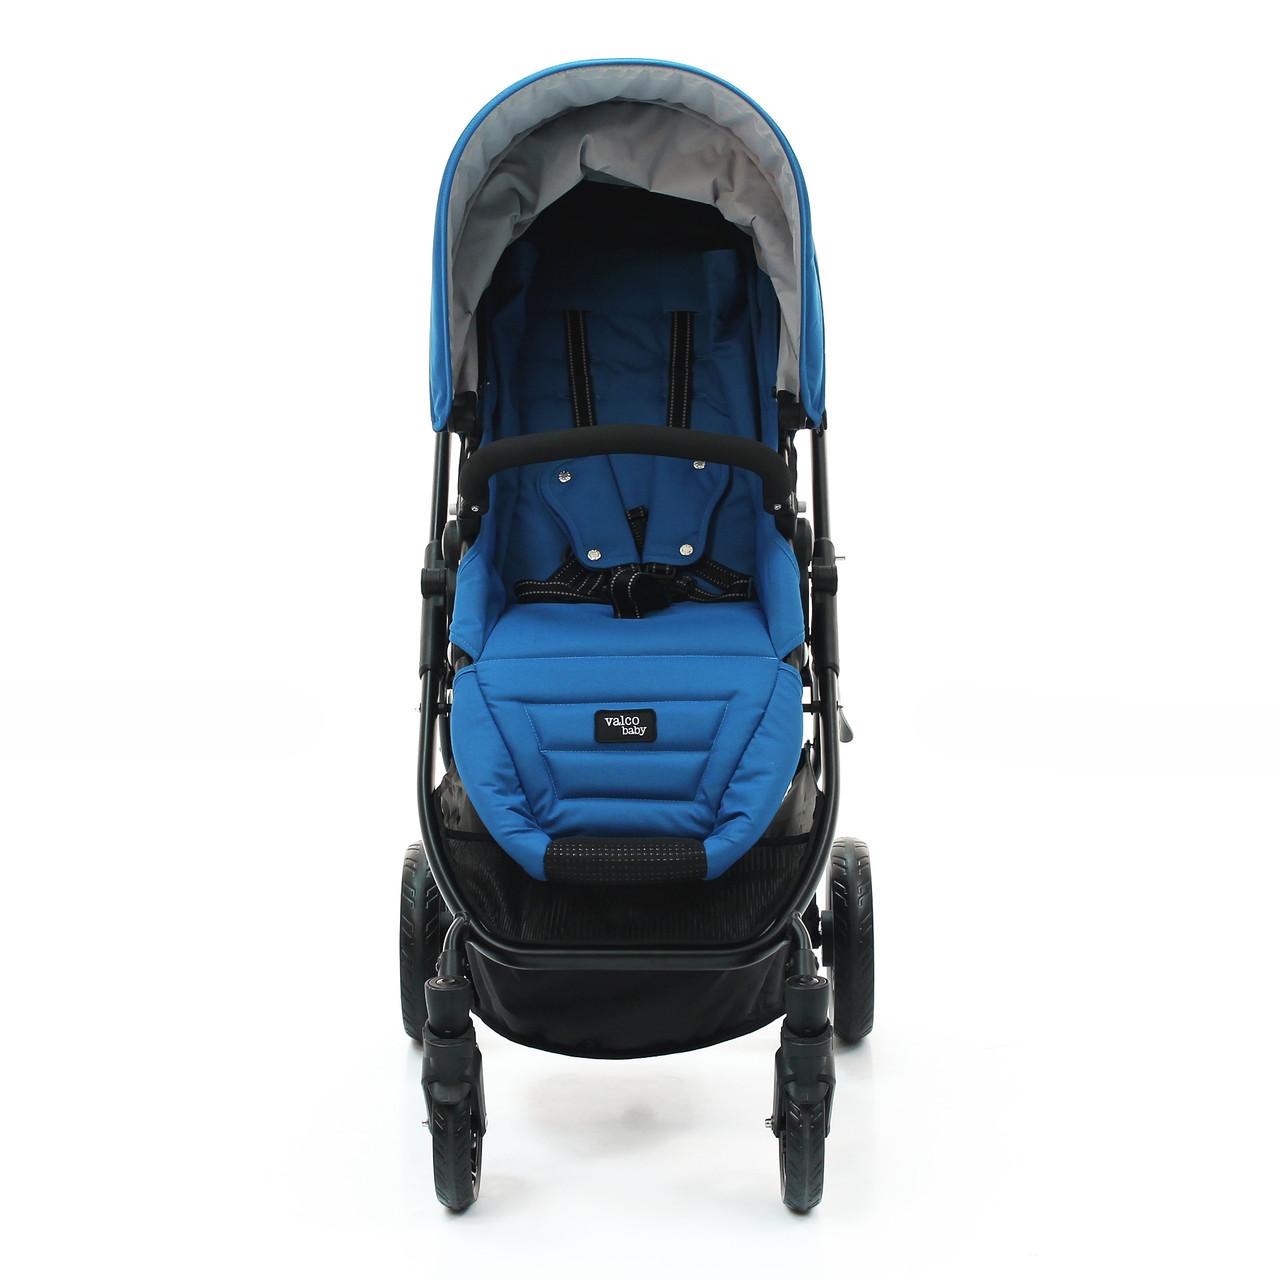 Коляска Valco baby Snap 4 Ultra цвет Ocean Blue